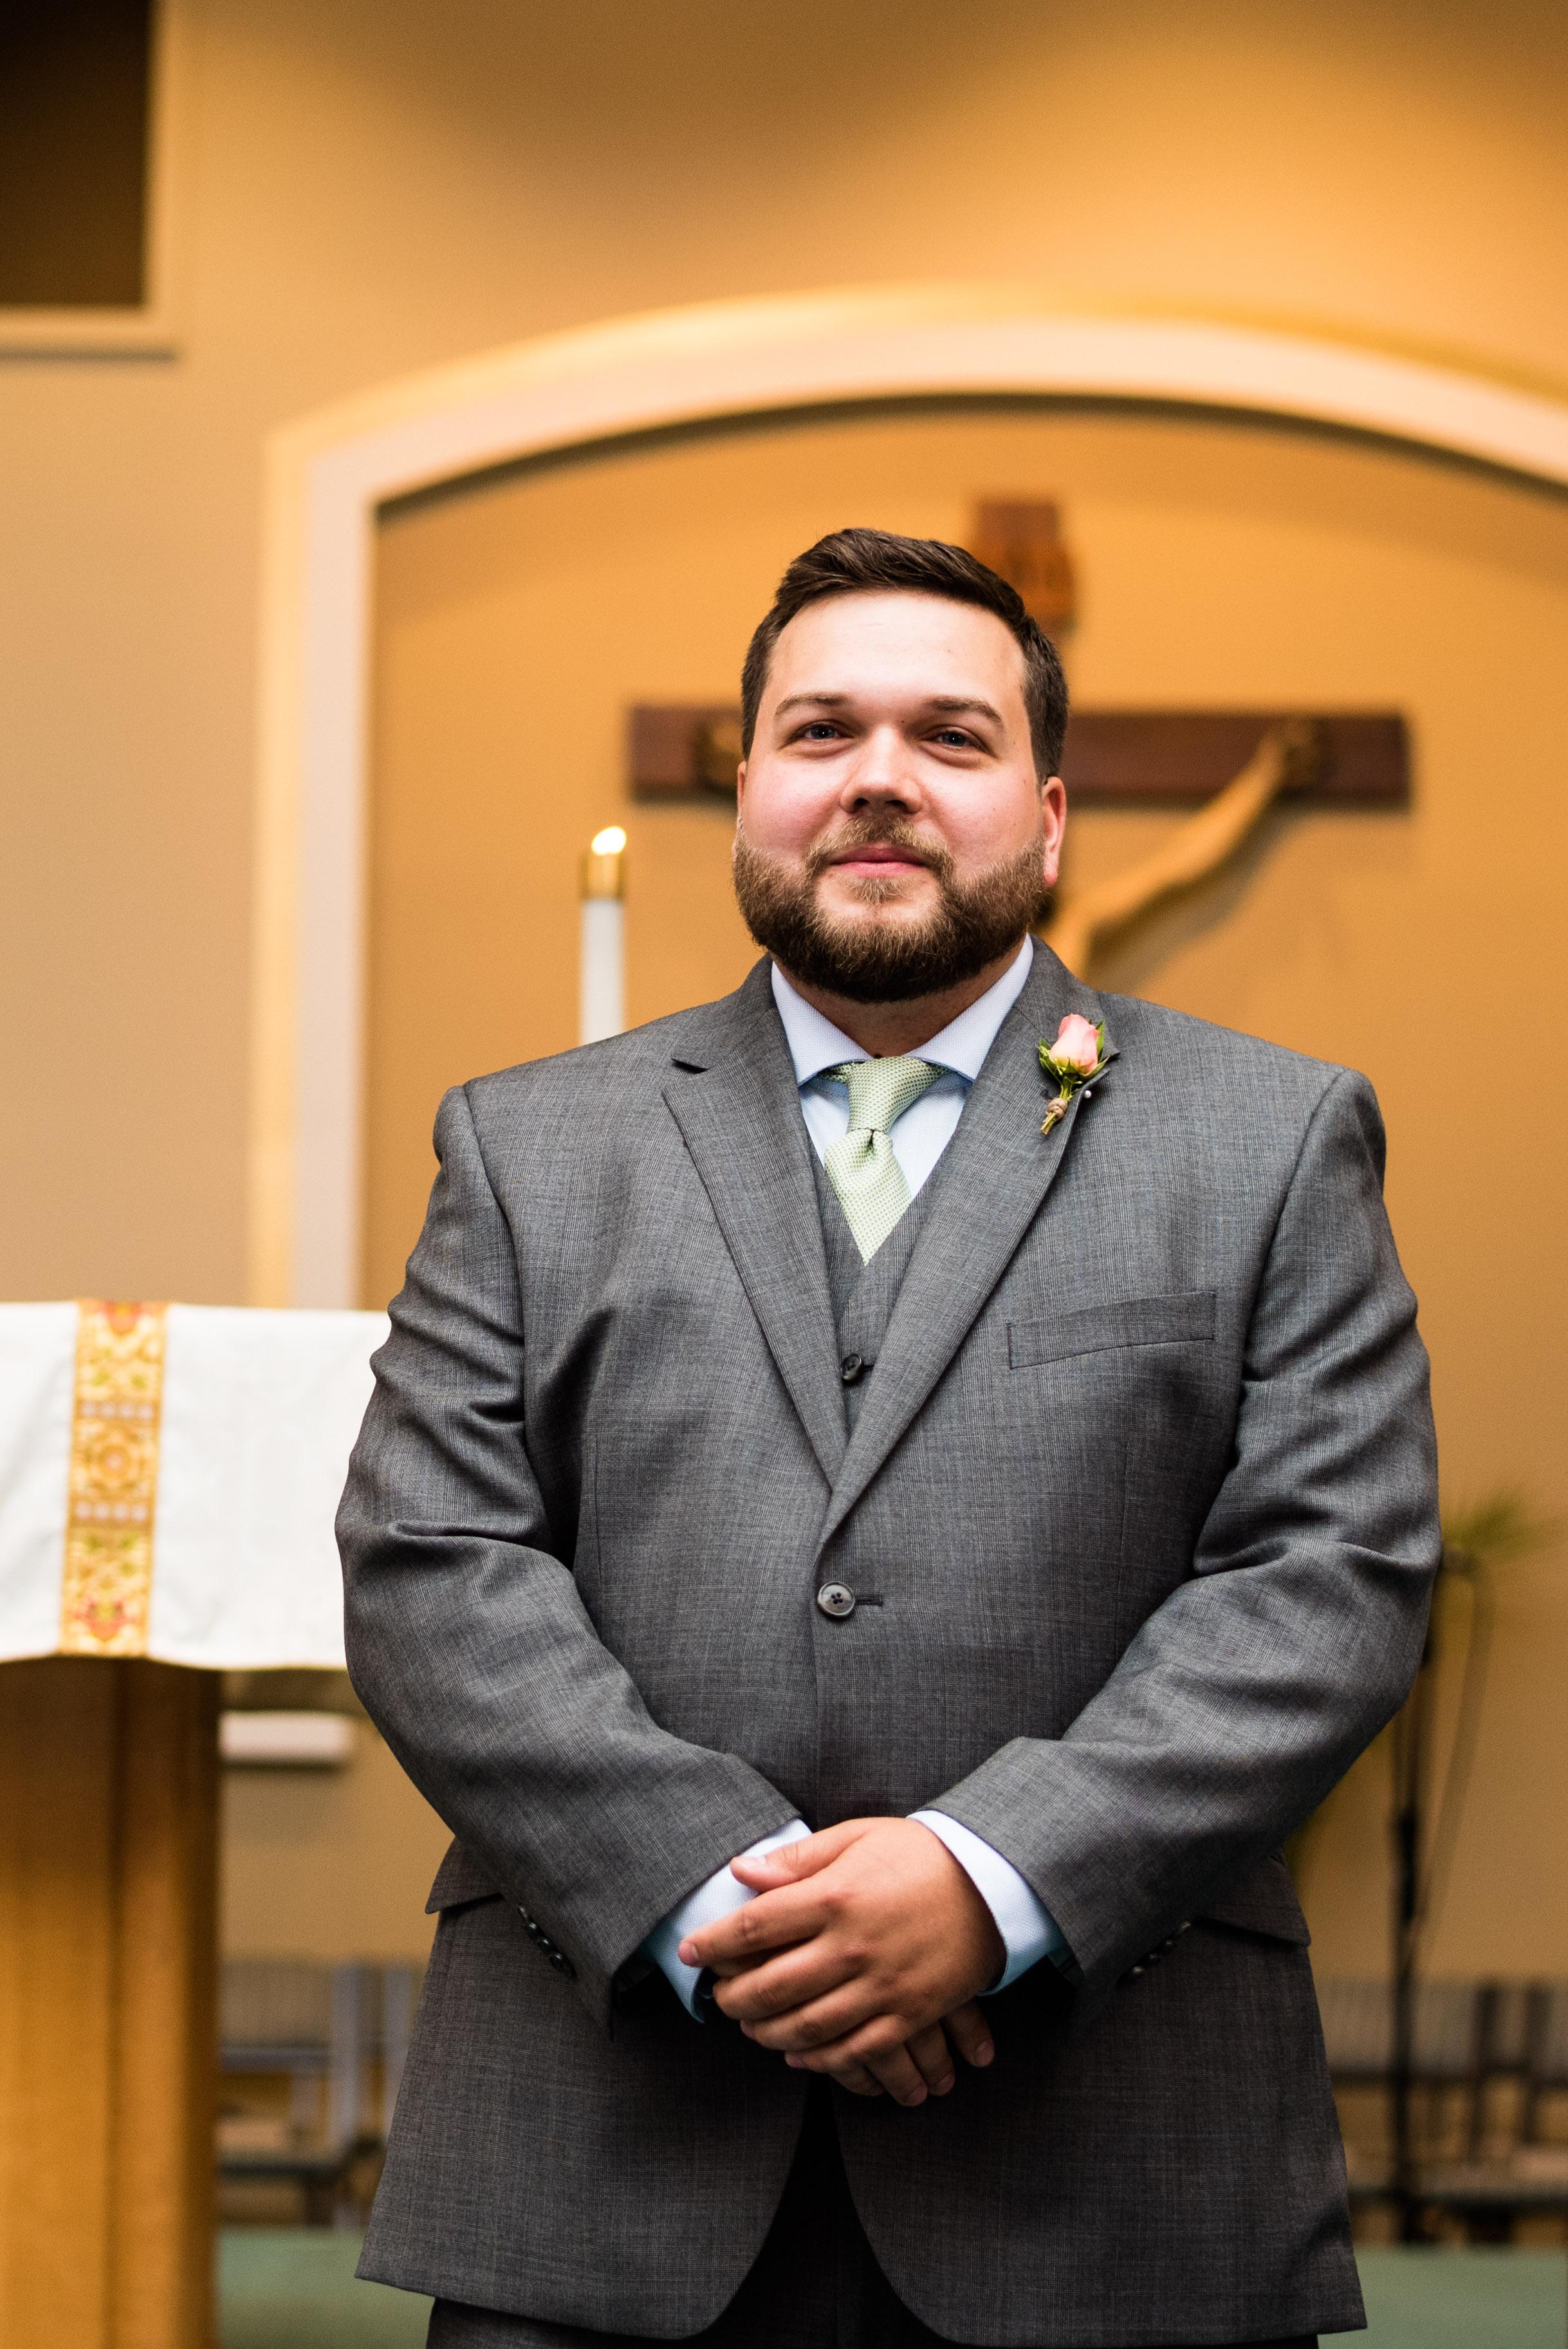 toledo church wedding photographer